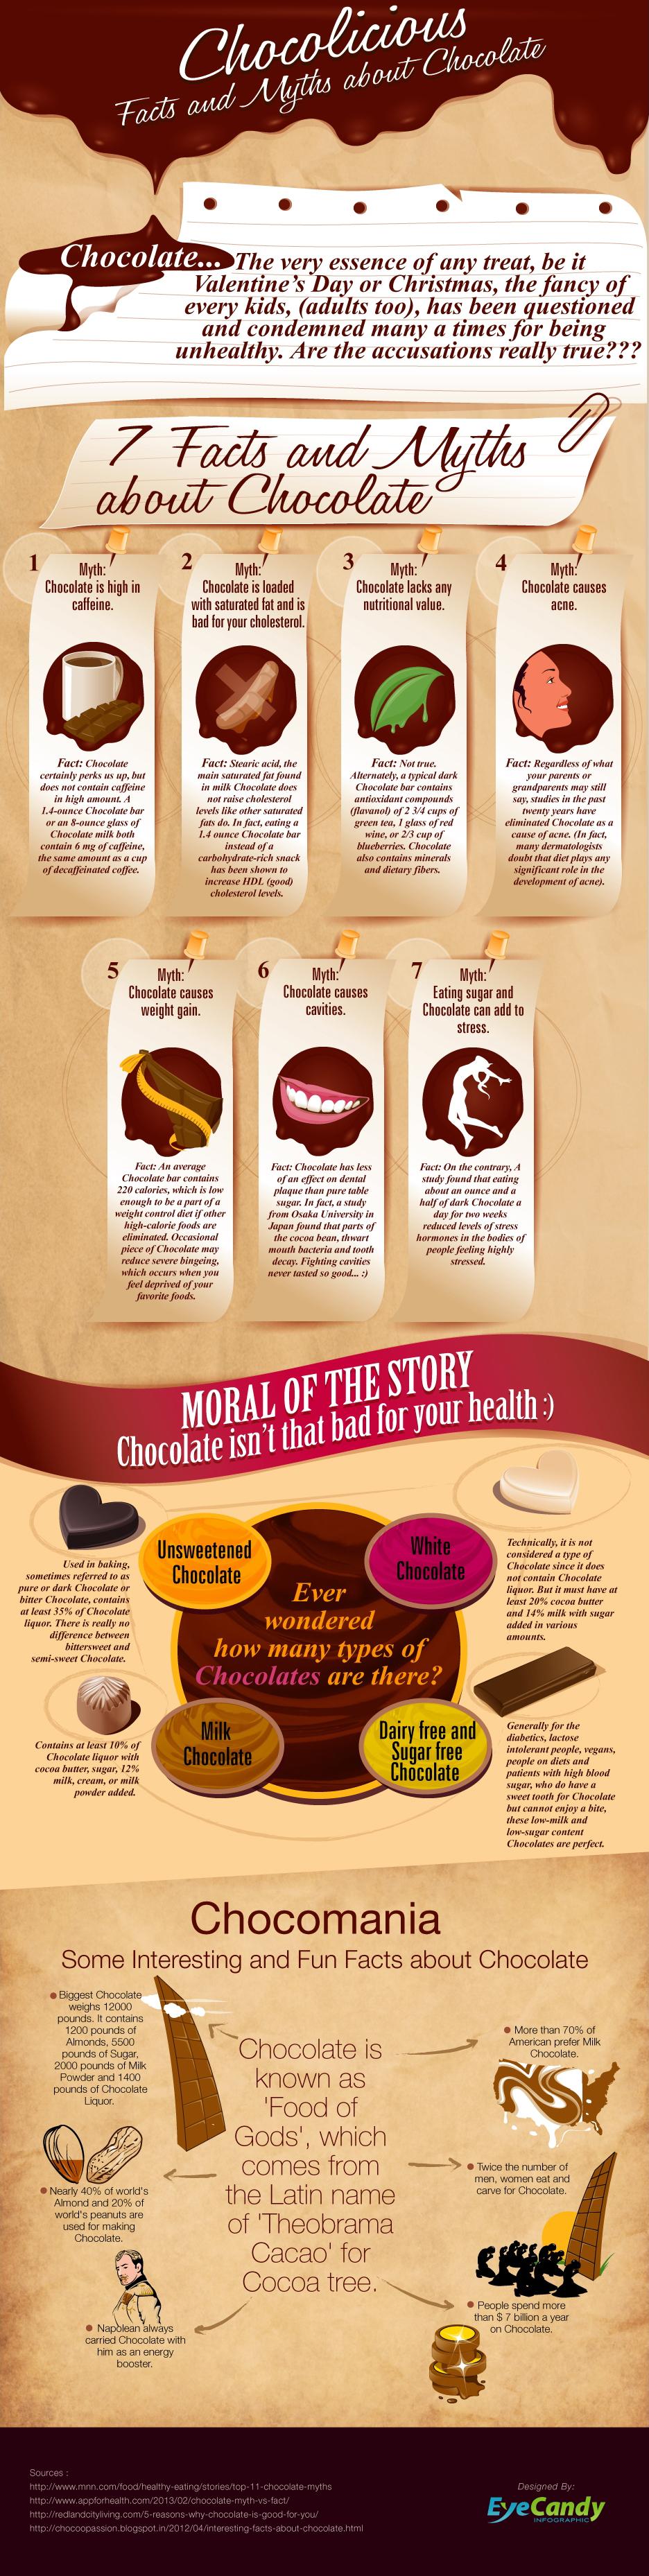 chocolate myth